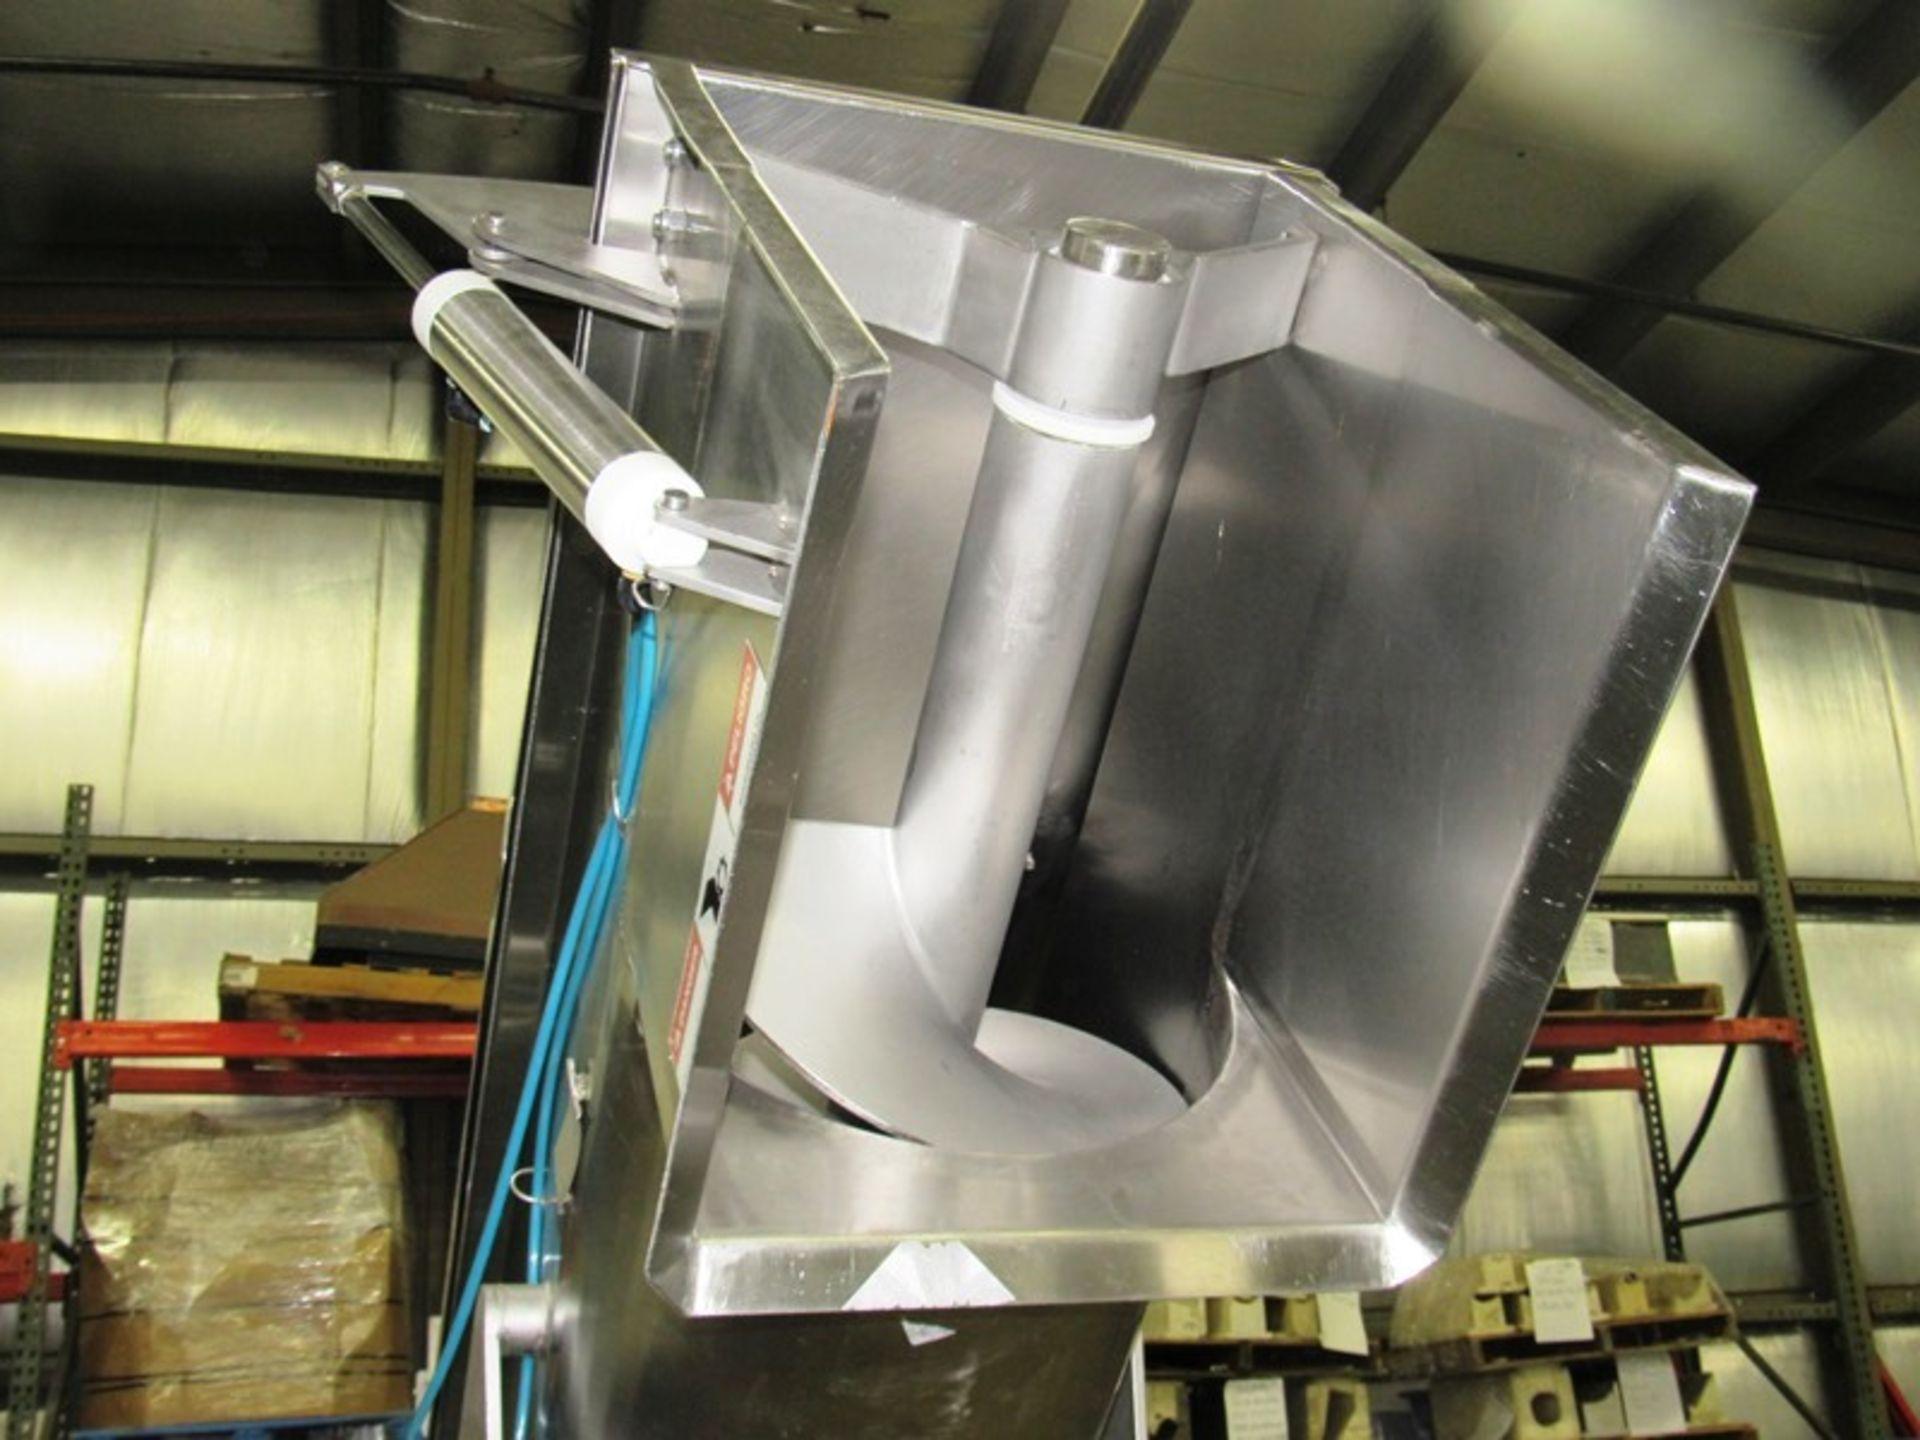 "Lot 13 - Equip Mdl. 249 Stainless Steel Screw Conveyor, Ser. #11871, 16"" Dia. X 9' L screw, 80"" discharge,"